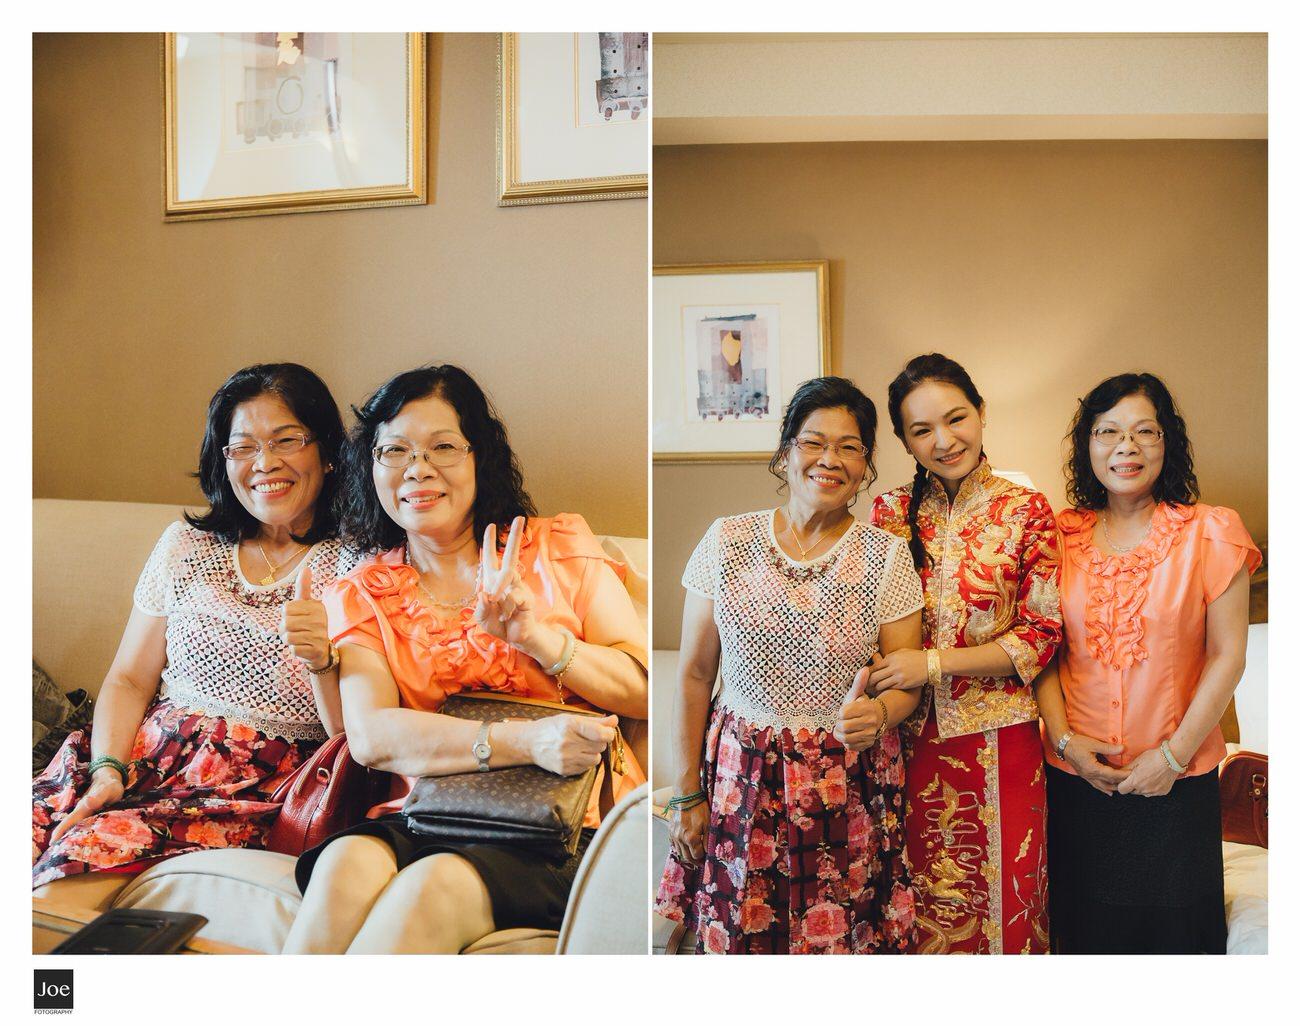 grand-hilai-hotel-wedding-daniel-yvette-joe-fotography-005.jpg